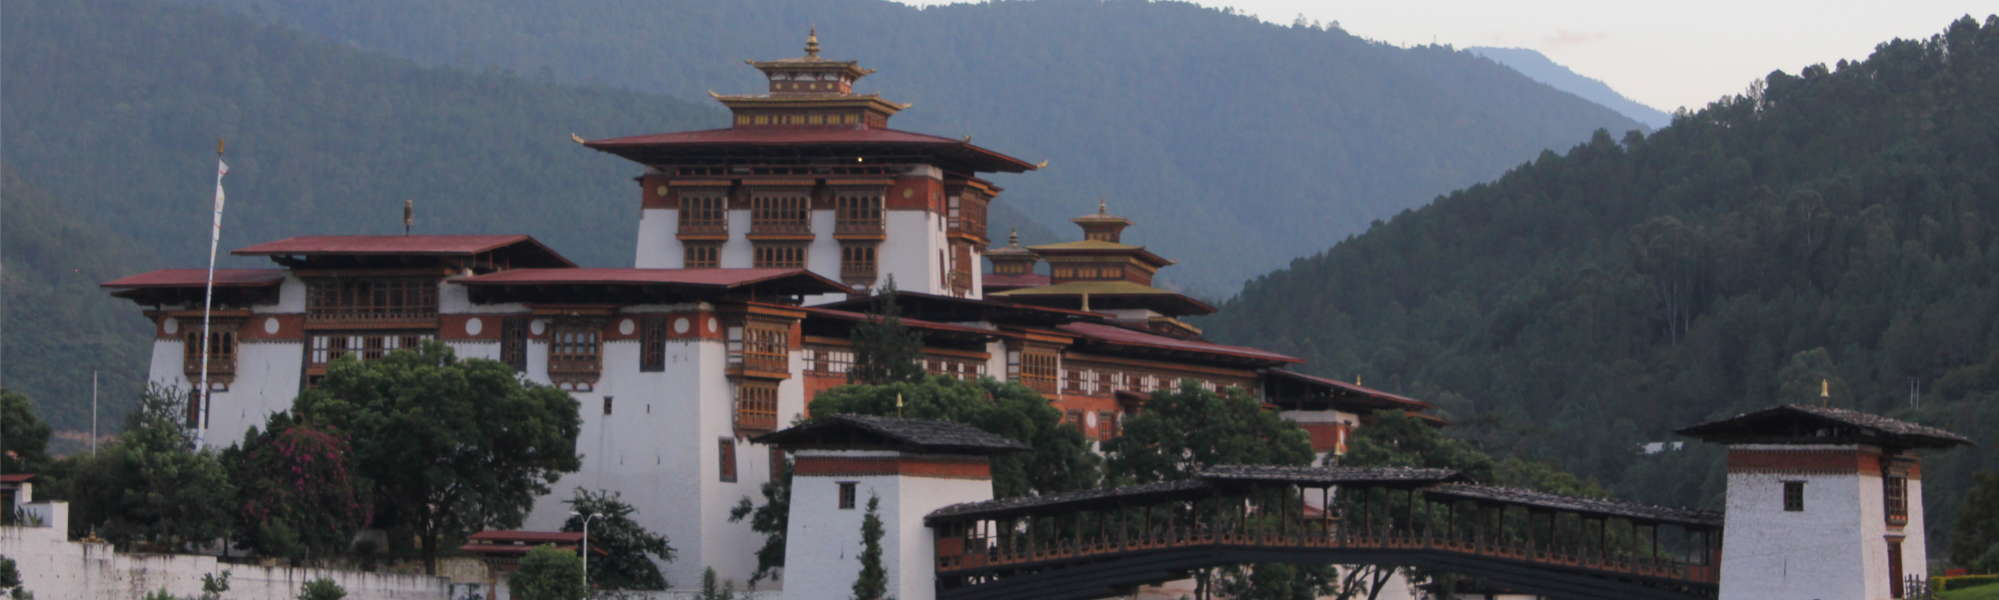 bhutan information